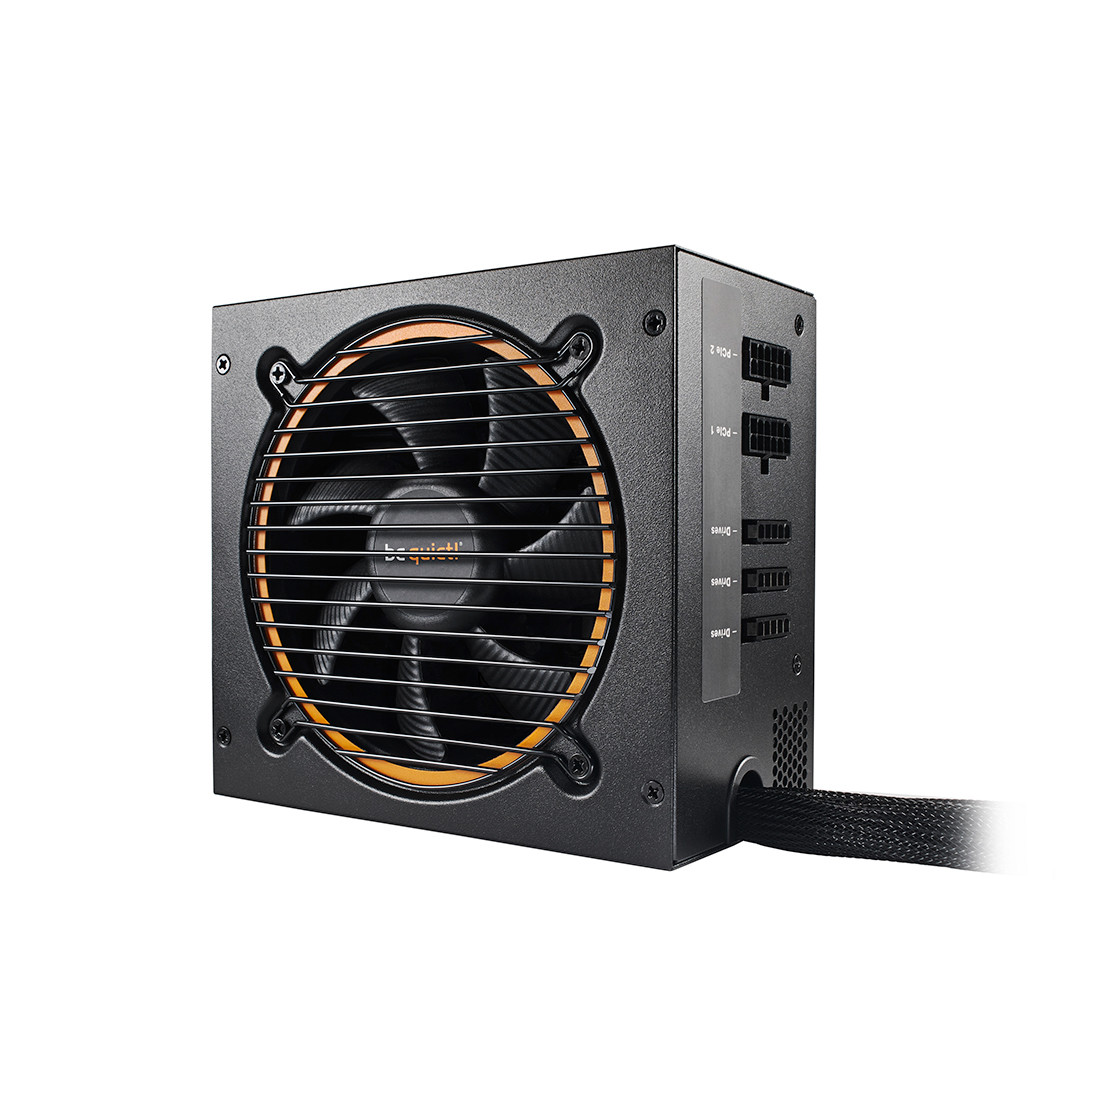 Блок питания, Bequiet!, Pure Power 11 600W CM, BN298, 600W, 80 PLUS Gold